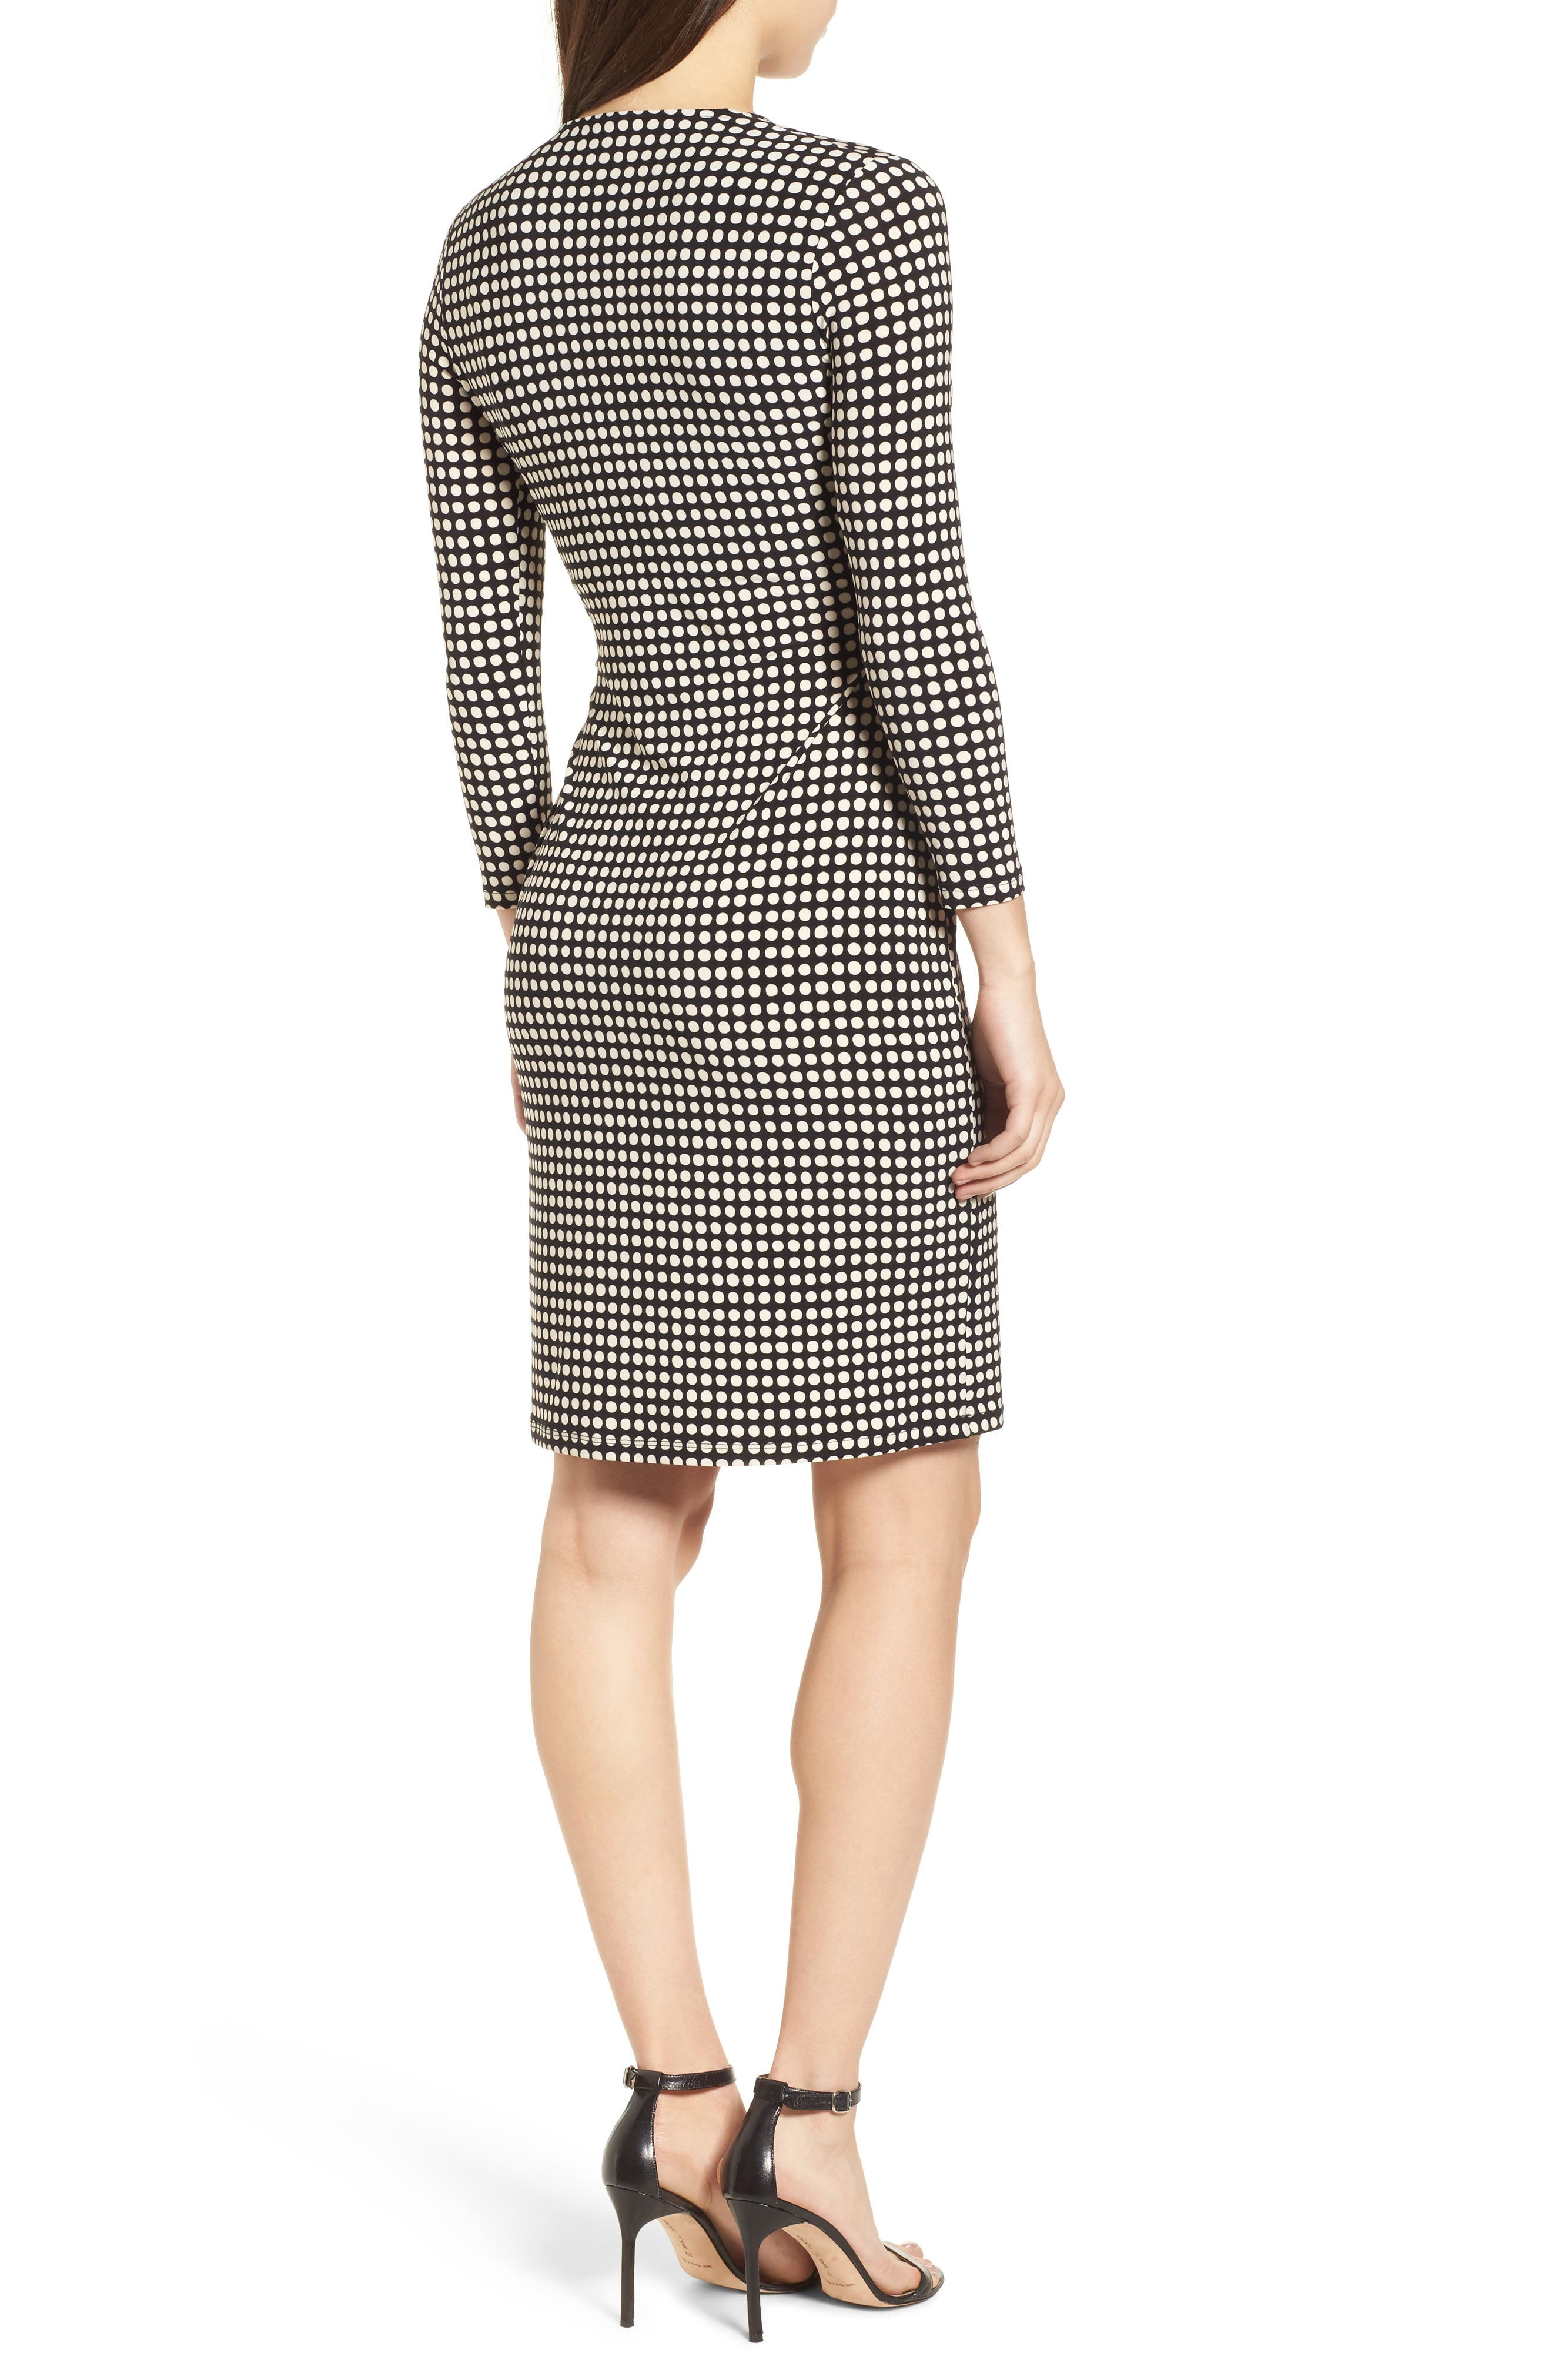 New York Pearly Dot Classic Wrap Dress,                             Alternate thumbnail 2, color,                             Black/ Parchment